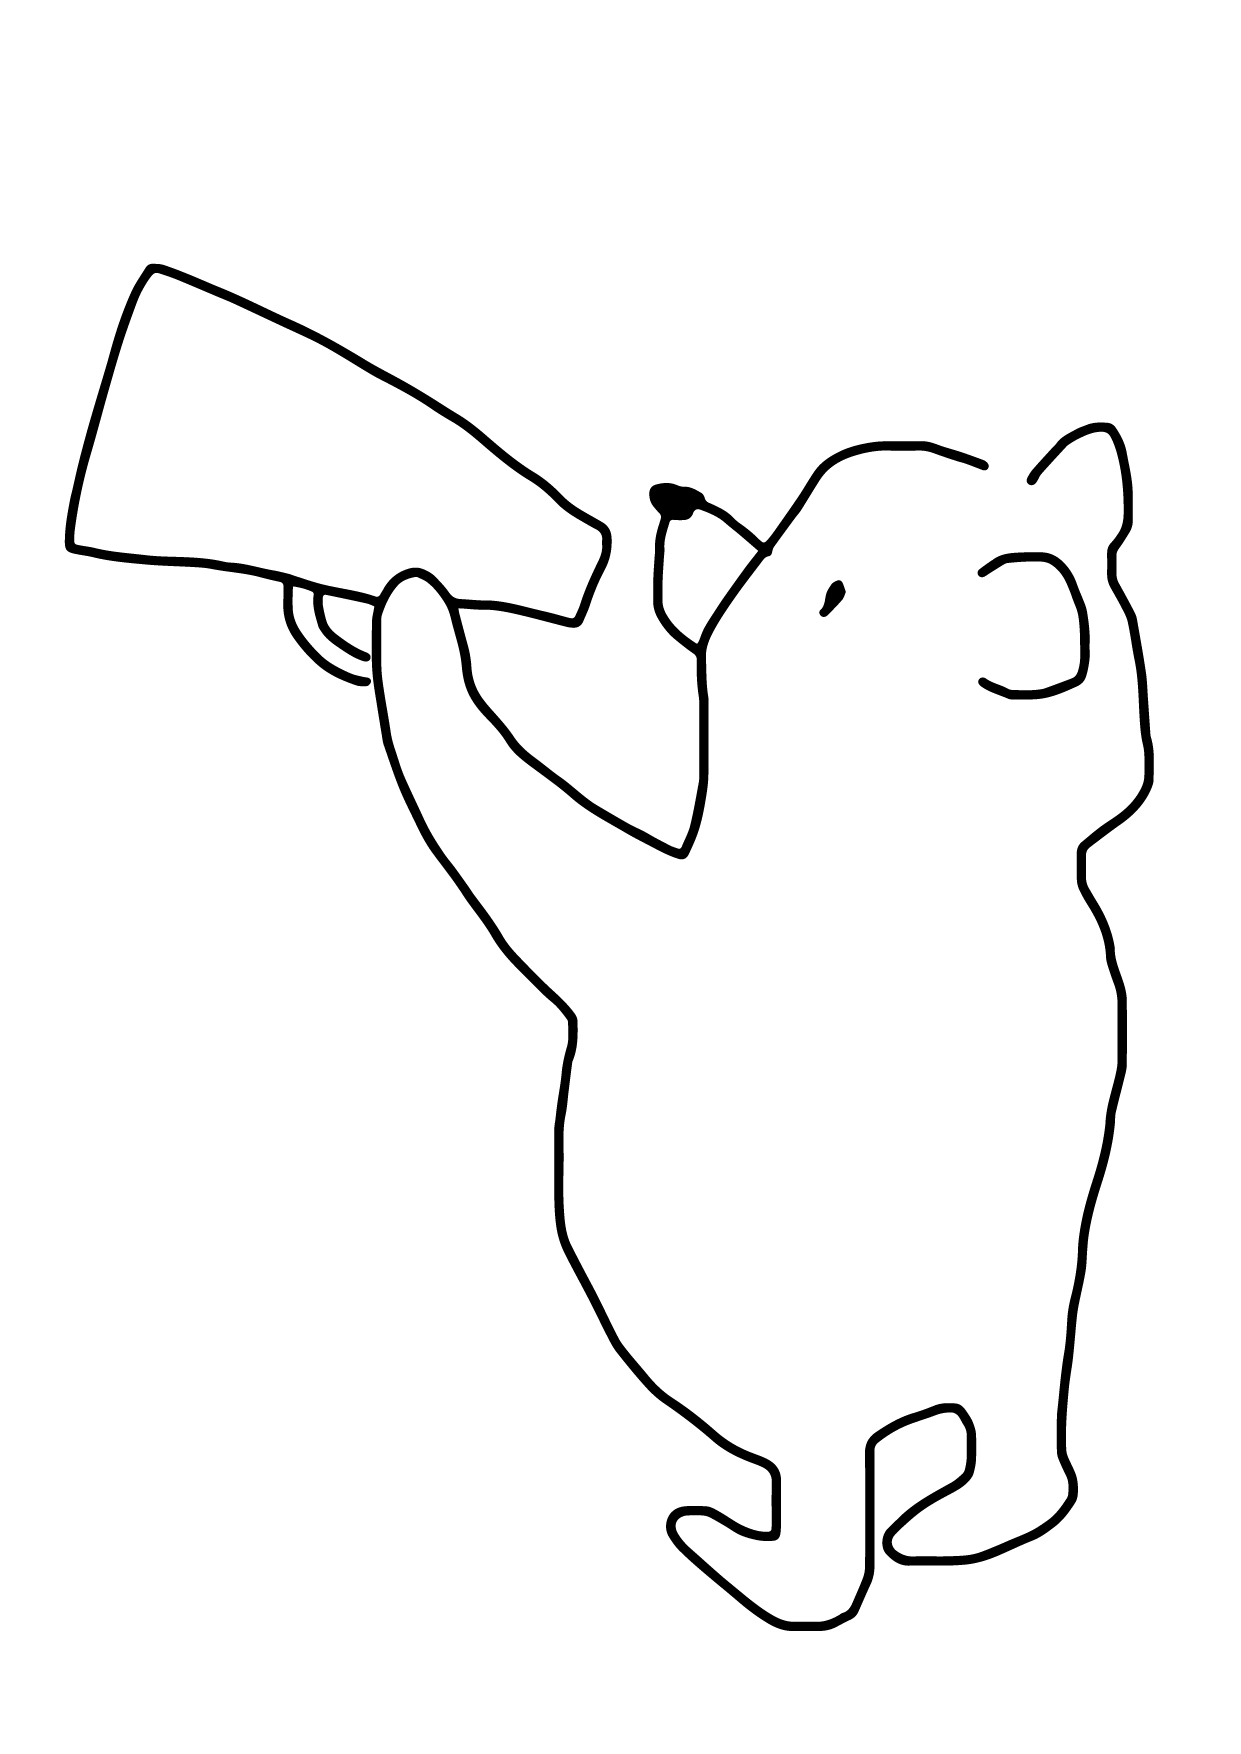 bears-10.png